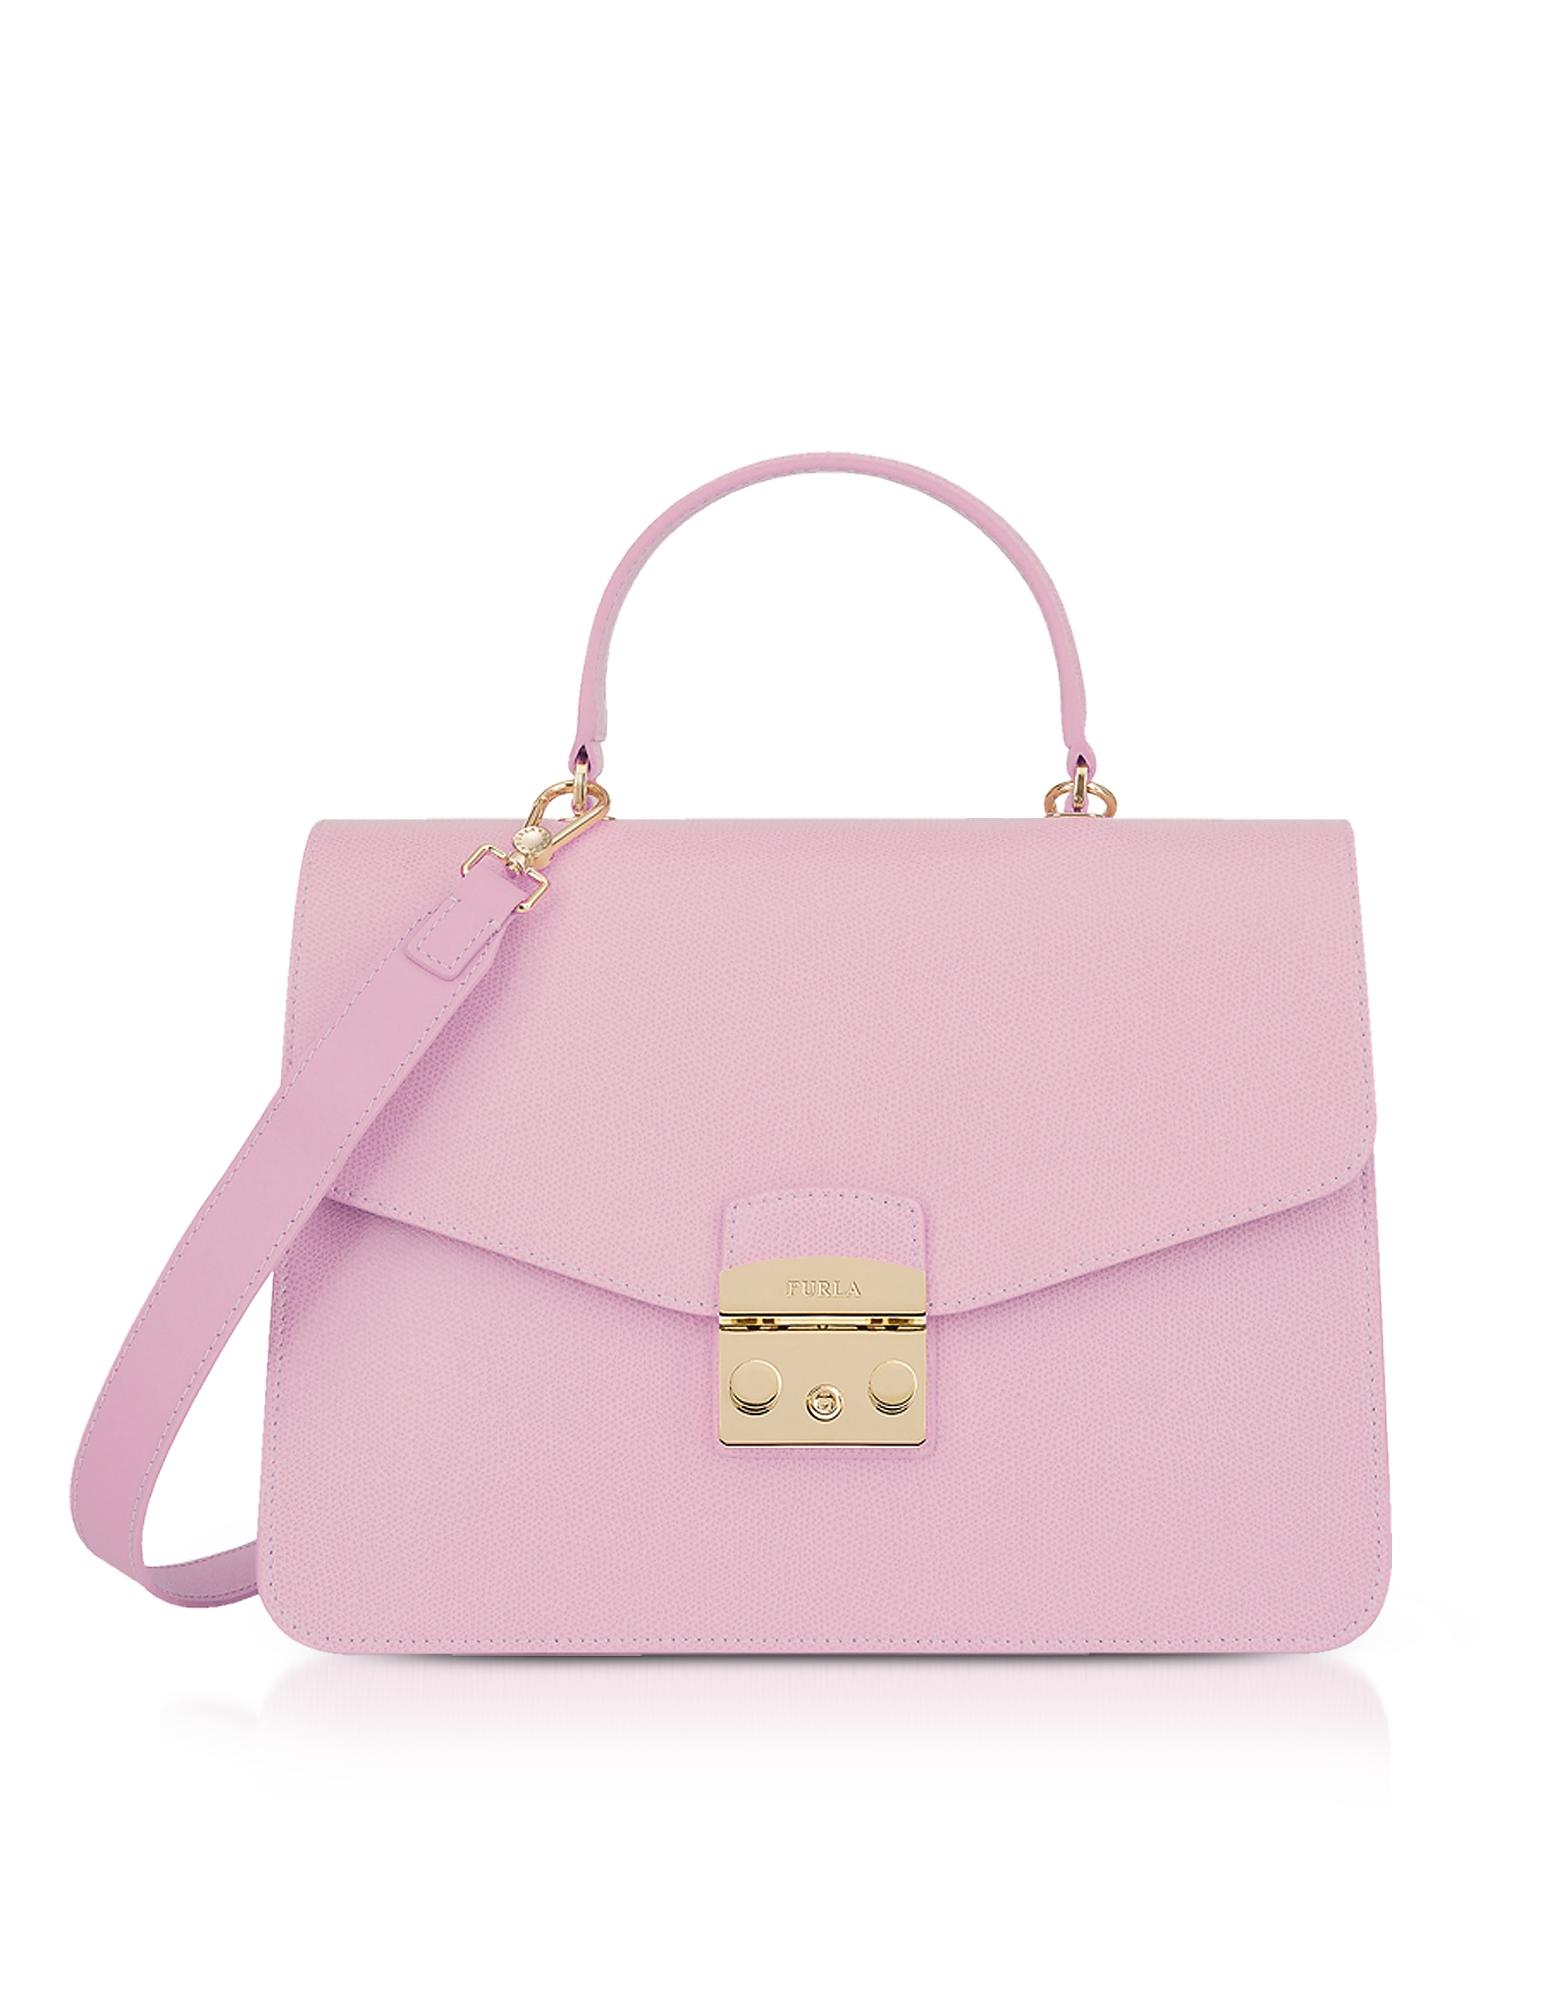 Furla Handbags, Camelia Lizard Printed Leather Metropolis Medium Top Handle Satchel Bag